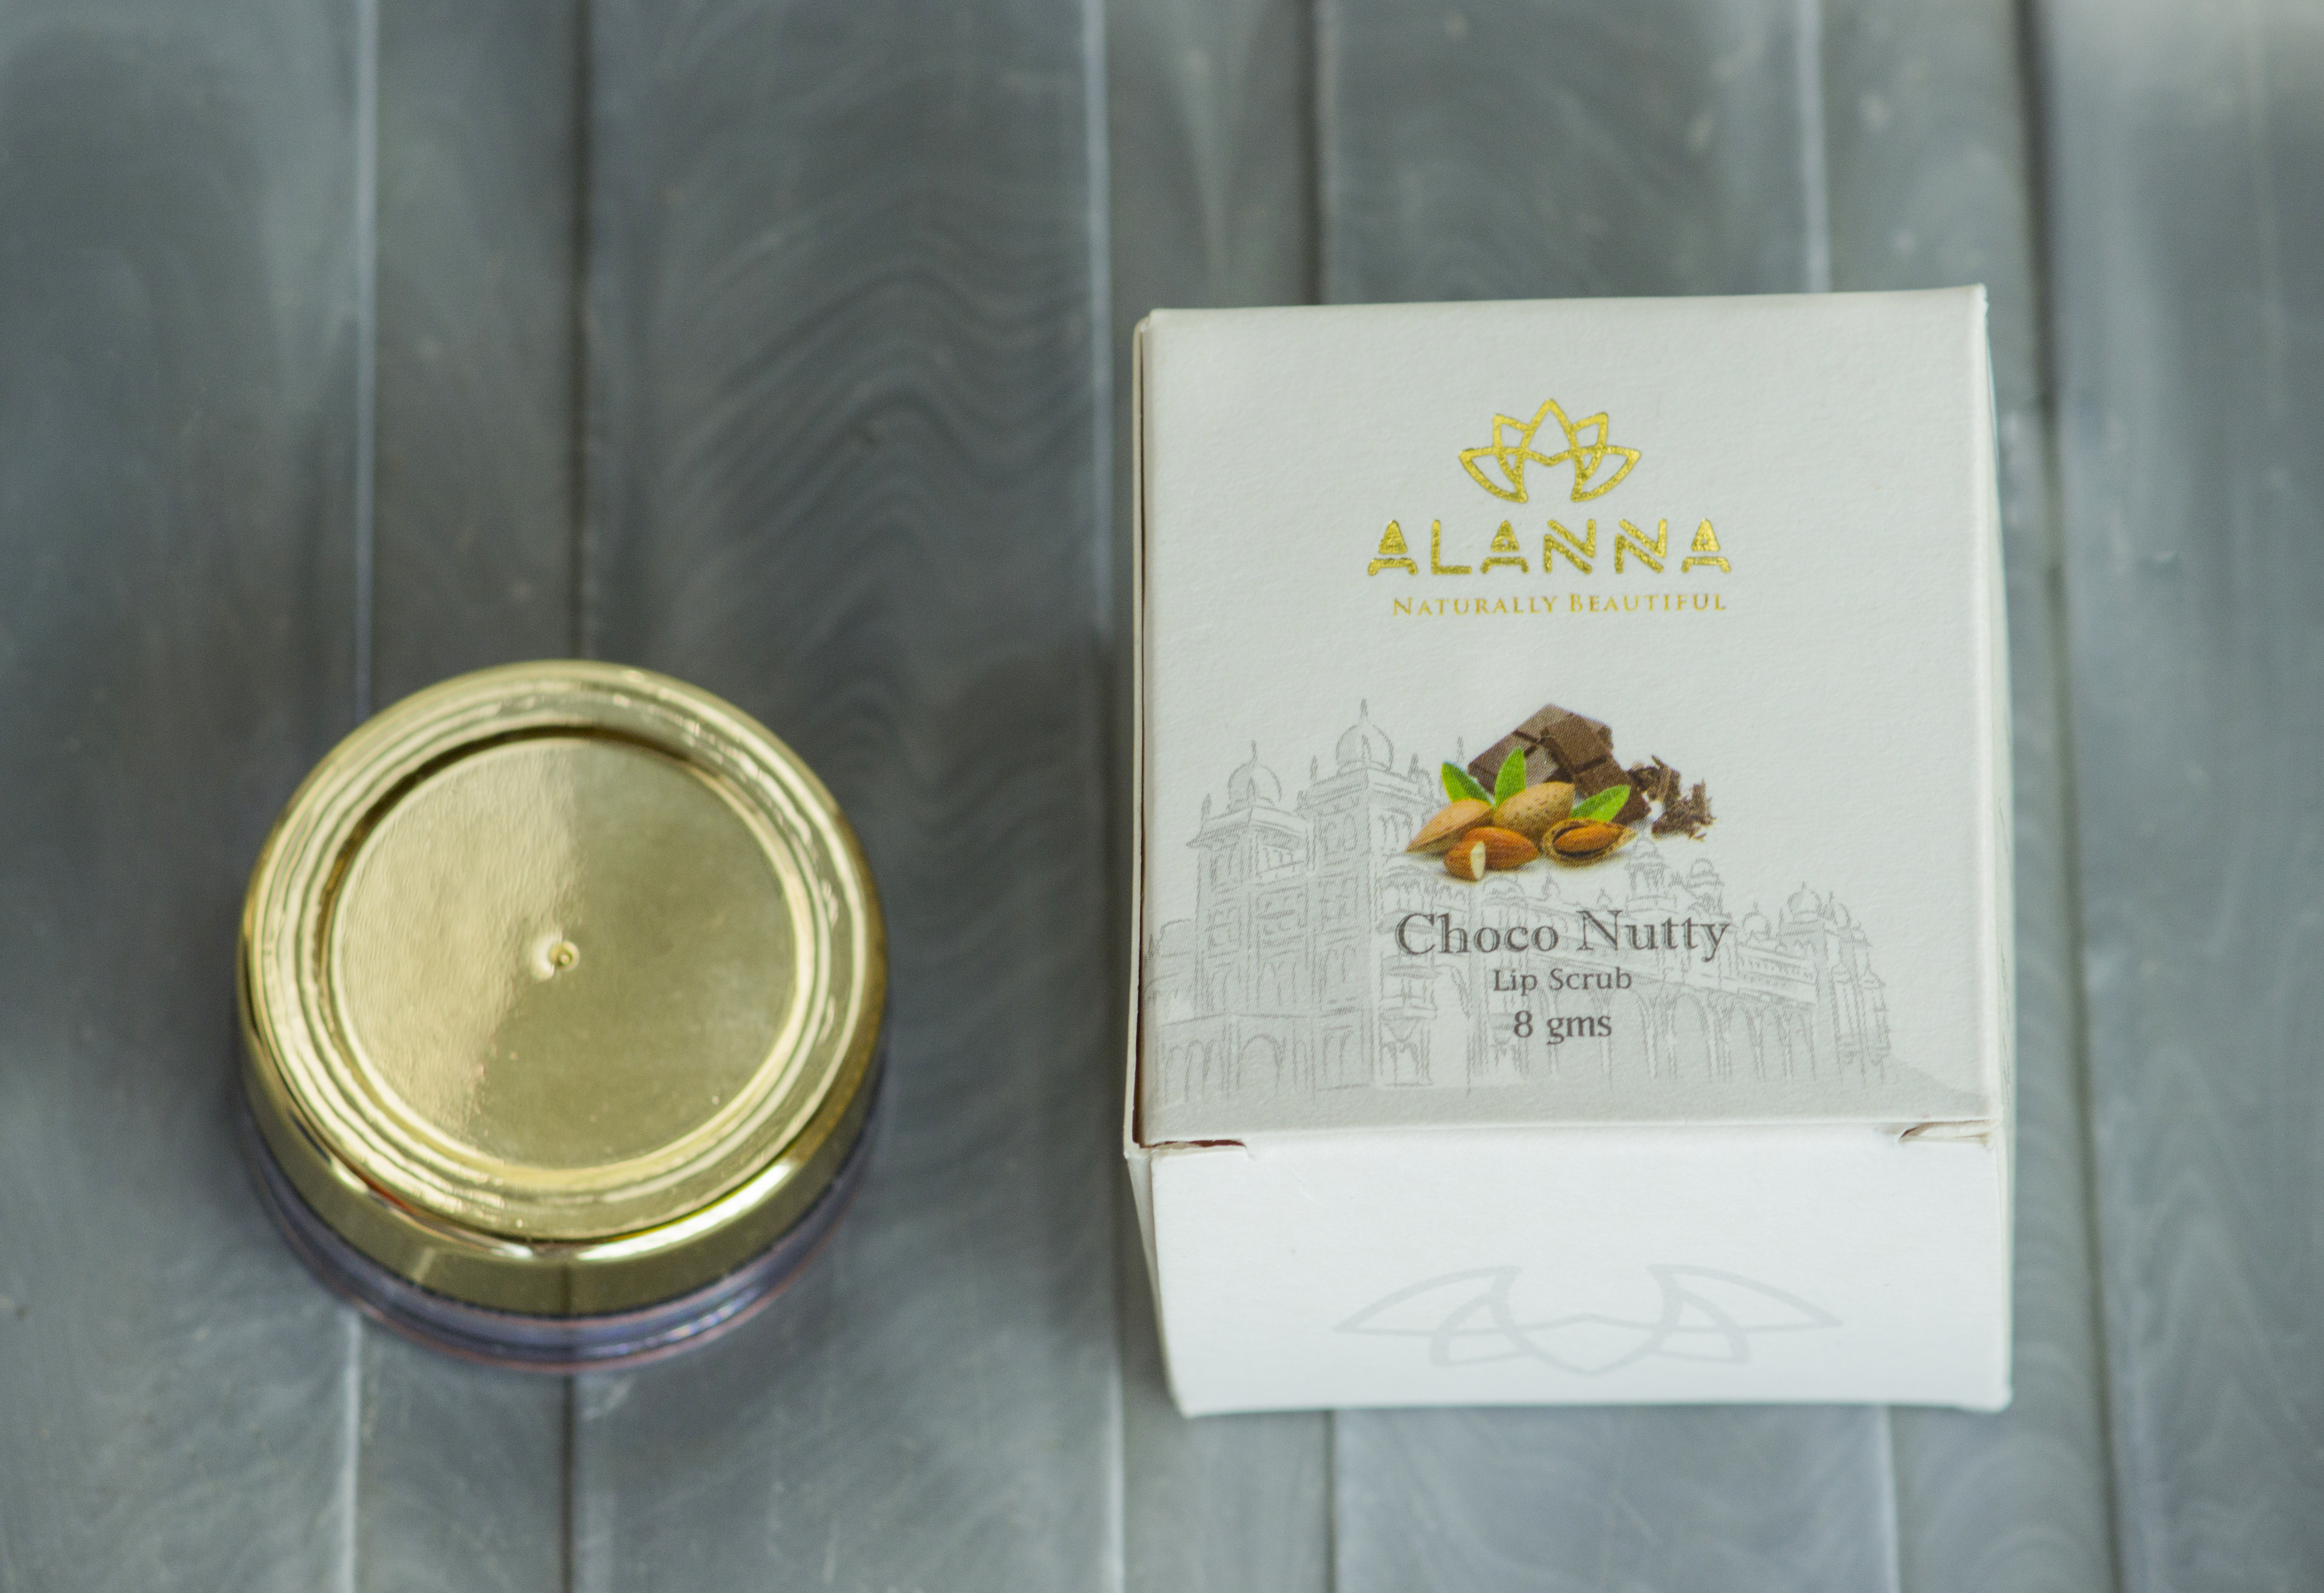 Alanna Naturally Beautiful- Choco Nutty Lip Scrub Review